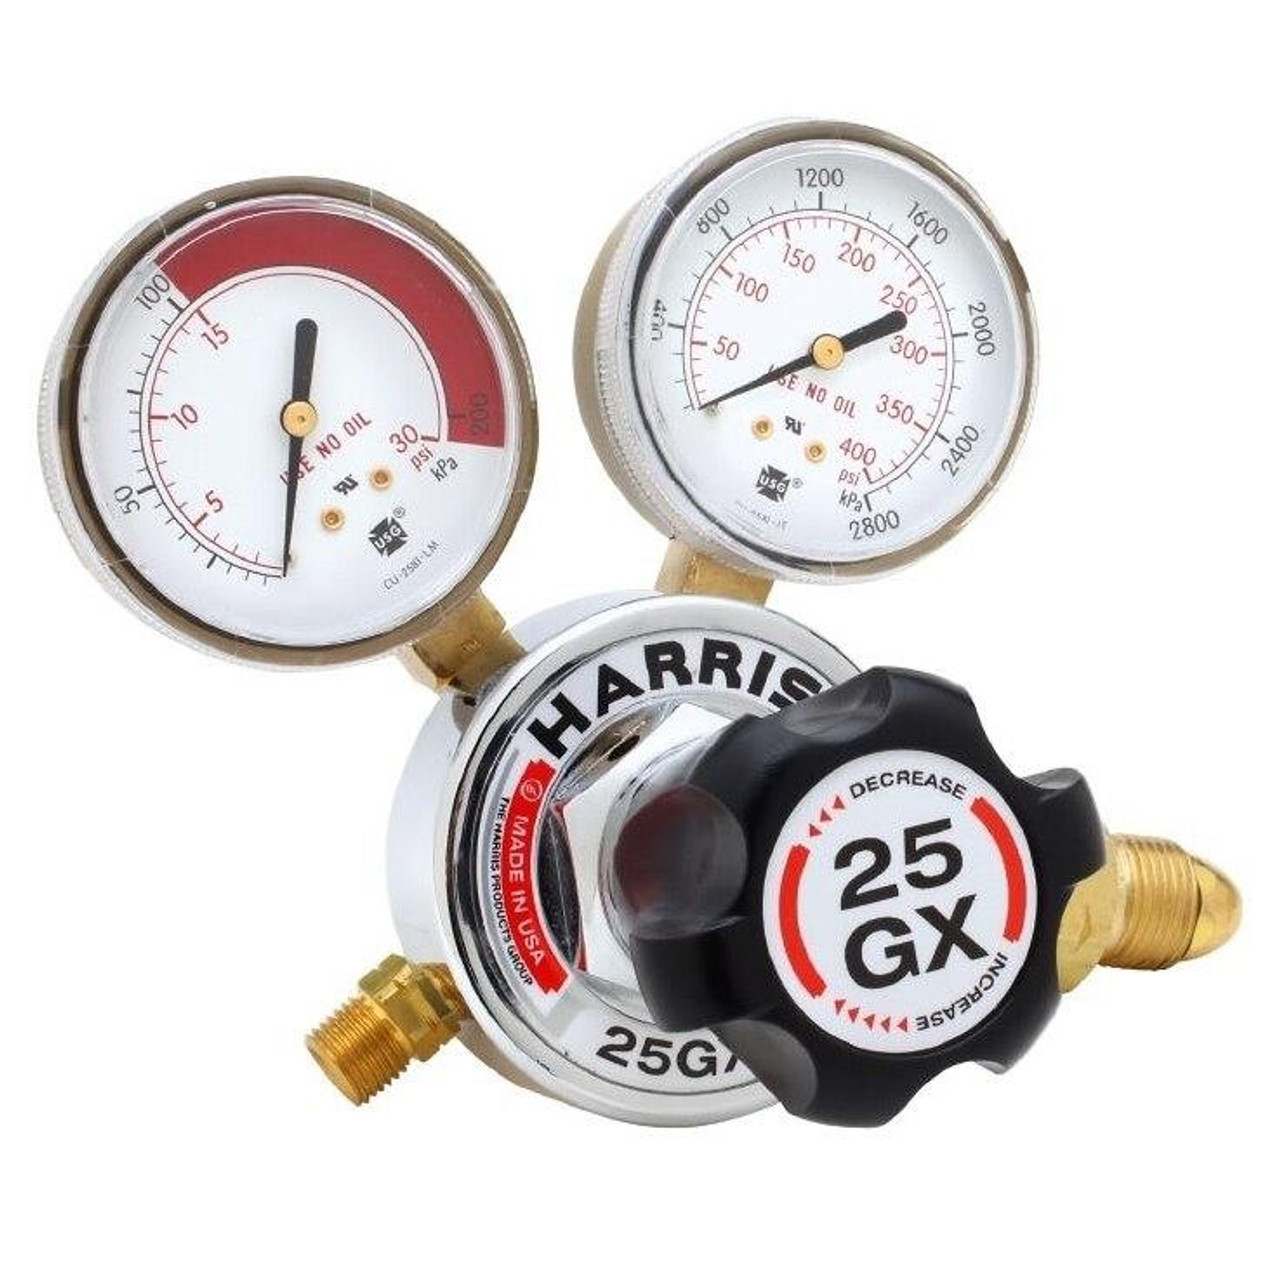 Harris Model 25GX Single Stage Acetylene Regulator CGA 510 Male 25GX-15-510 - 3000380